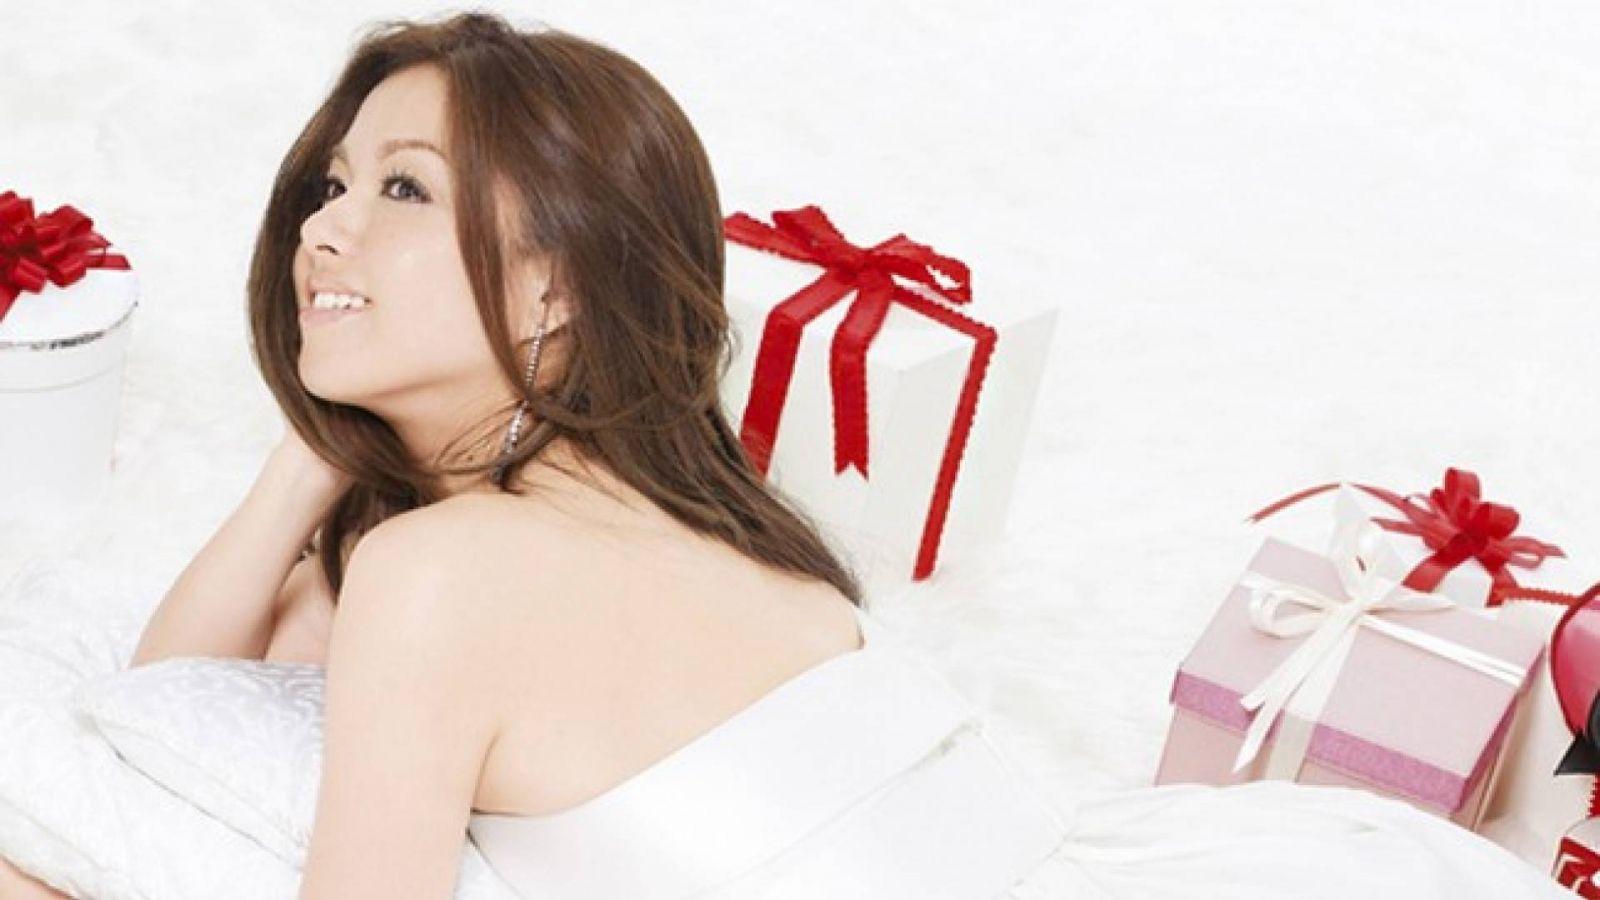 Ito Yuna © Sony Music Entertainment (Japan) Inc.